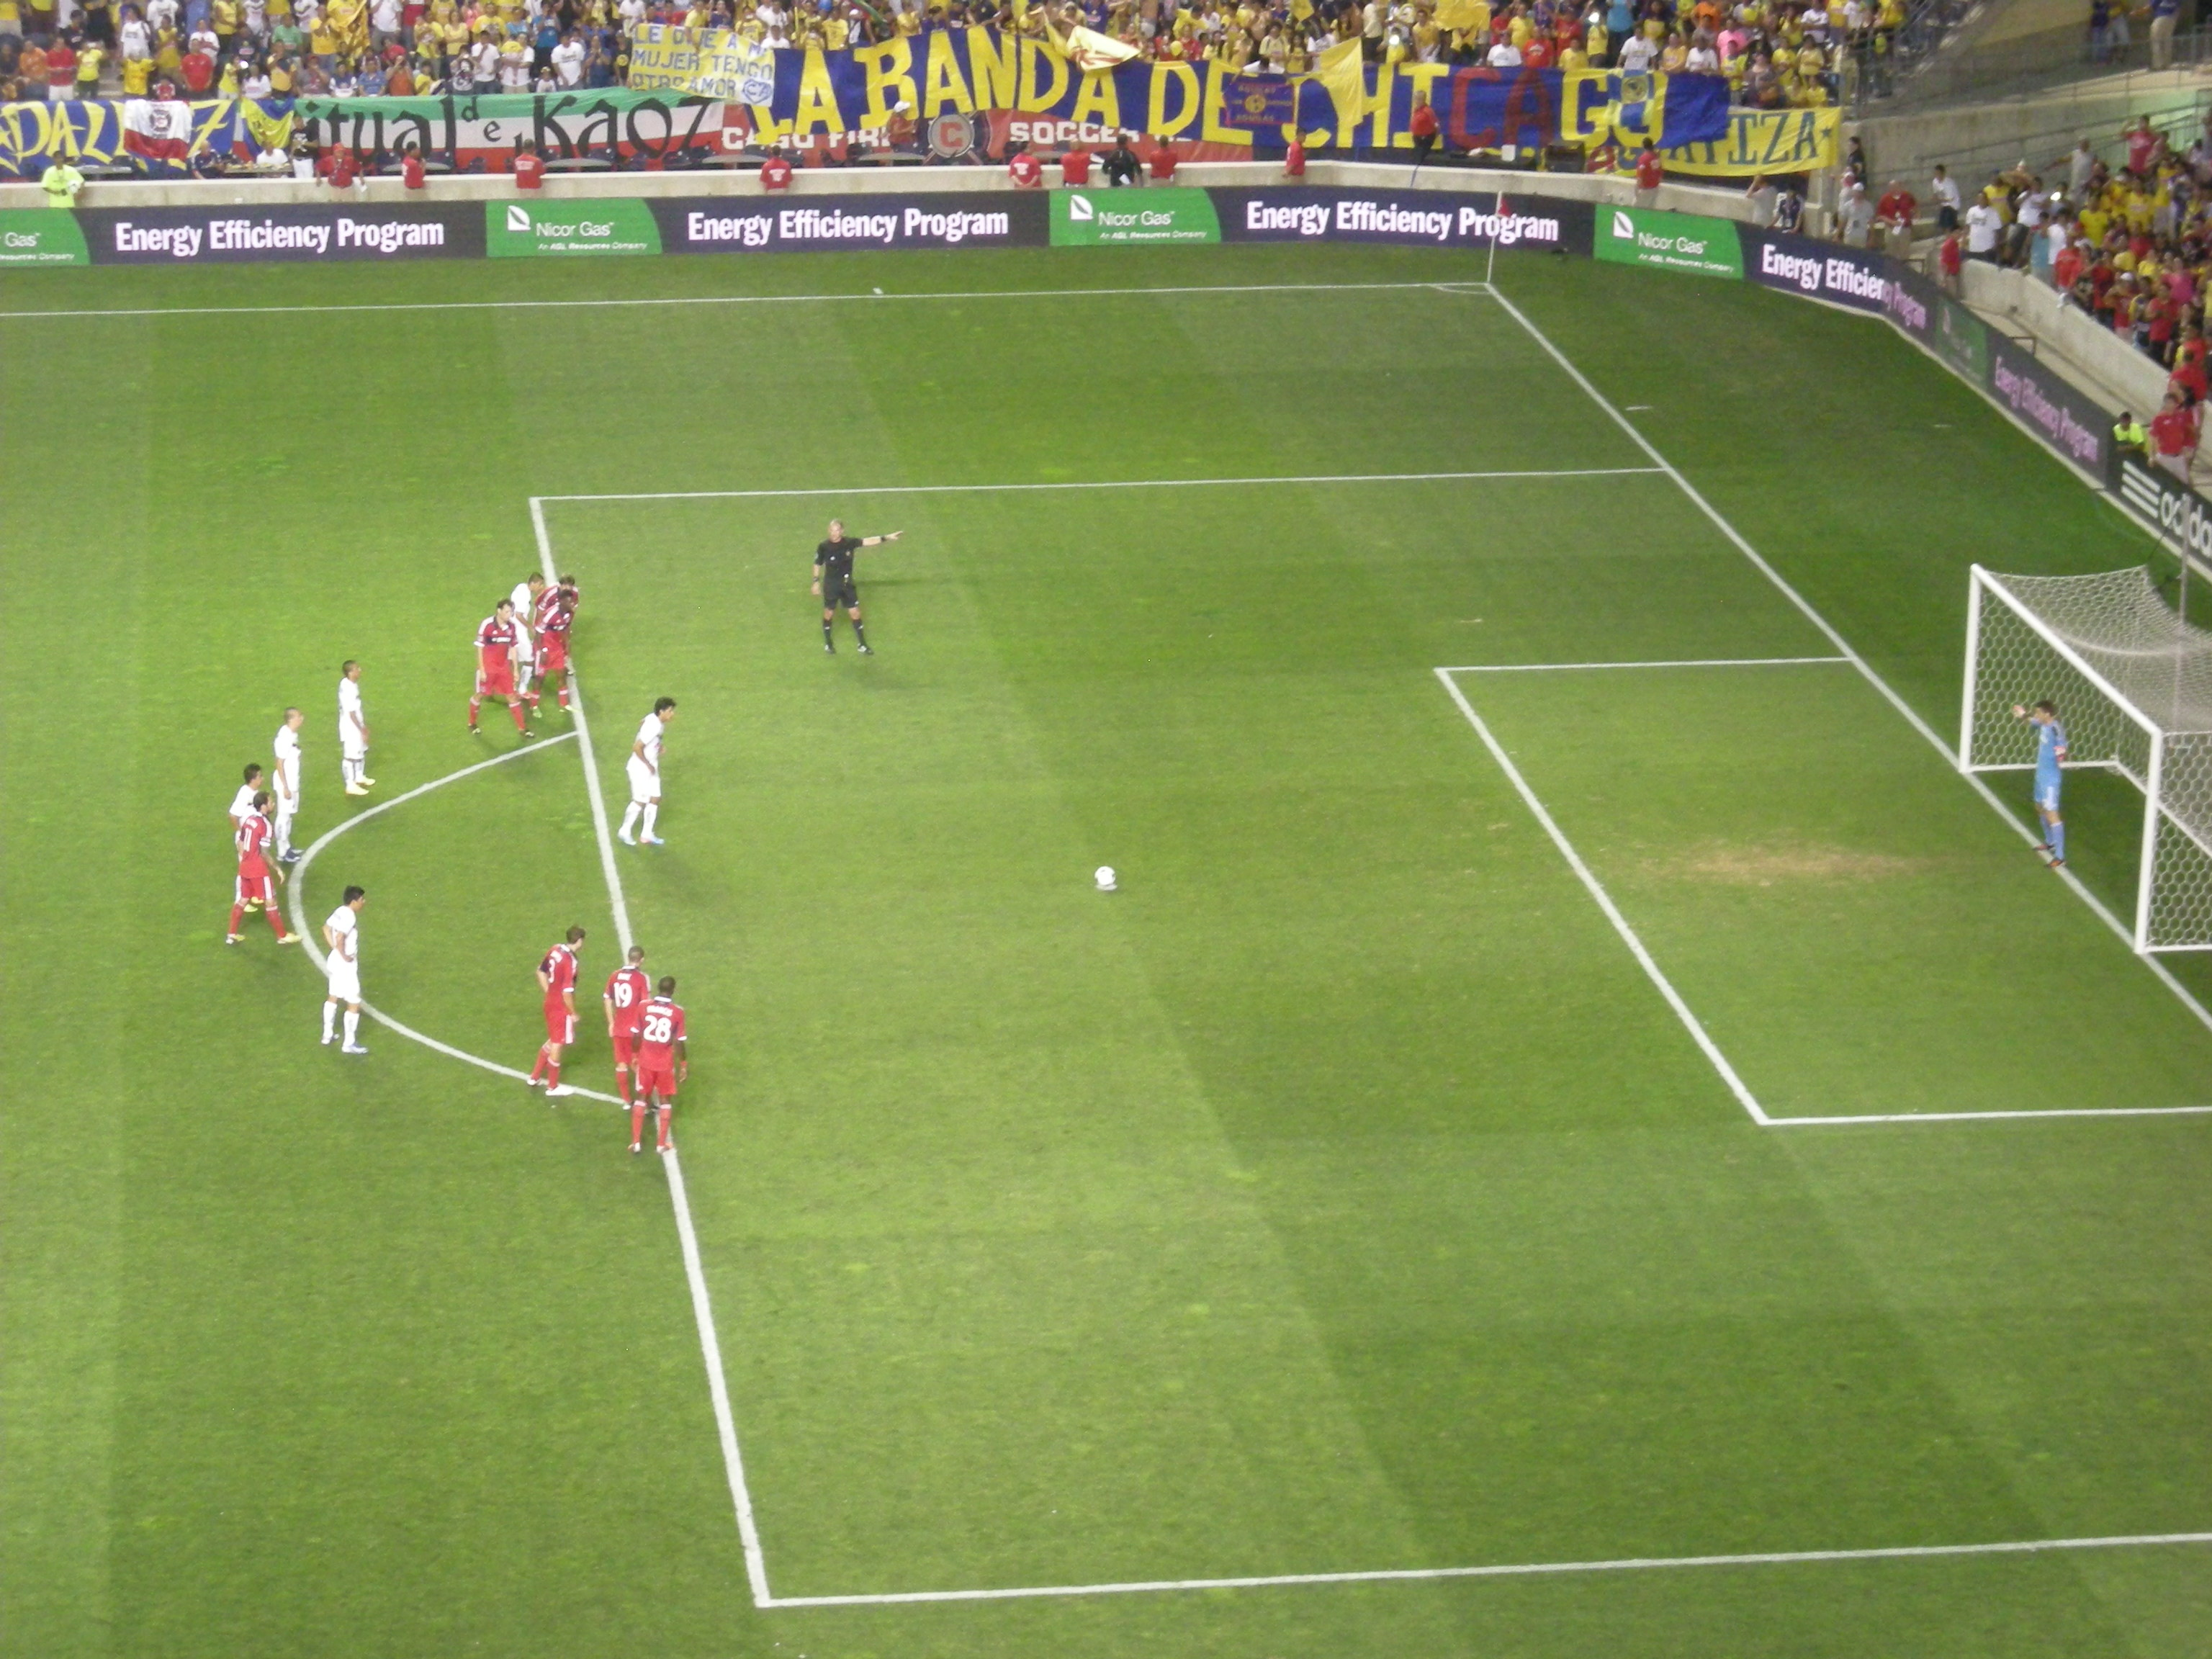 ff95afdee65 Penalty kick (association football) - Wikipedia